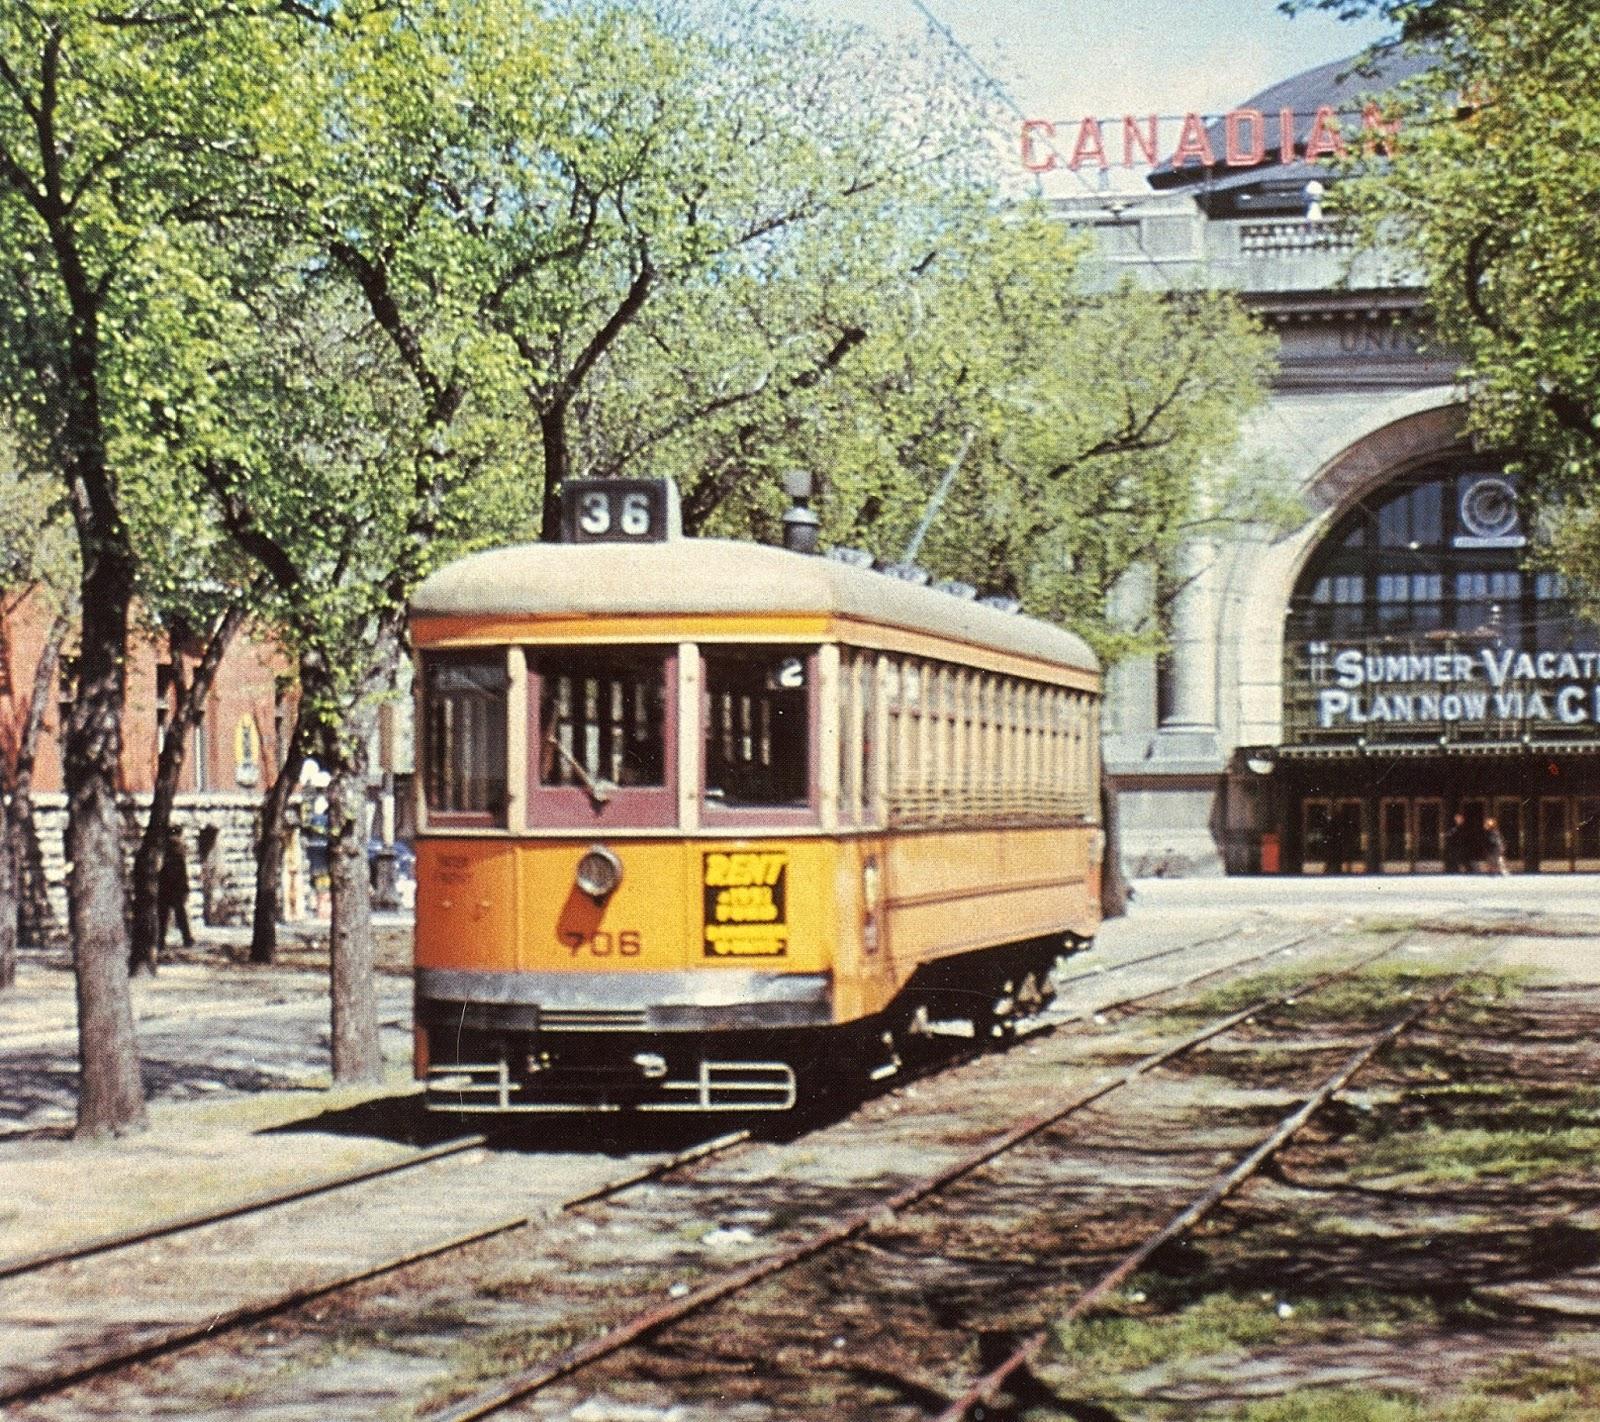 here s something our good friend zenon lisakowski sent us it s a locally produced retrospective film on winnipeg s streetcar system